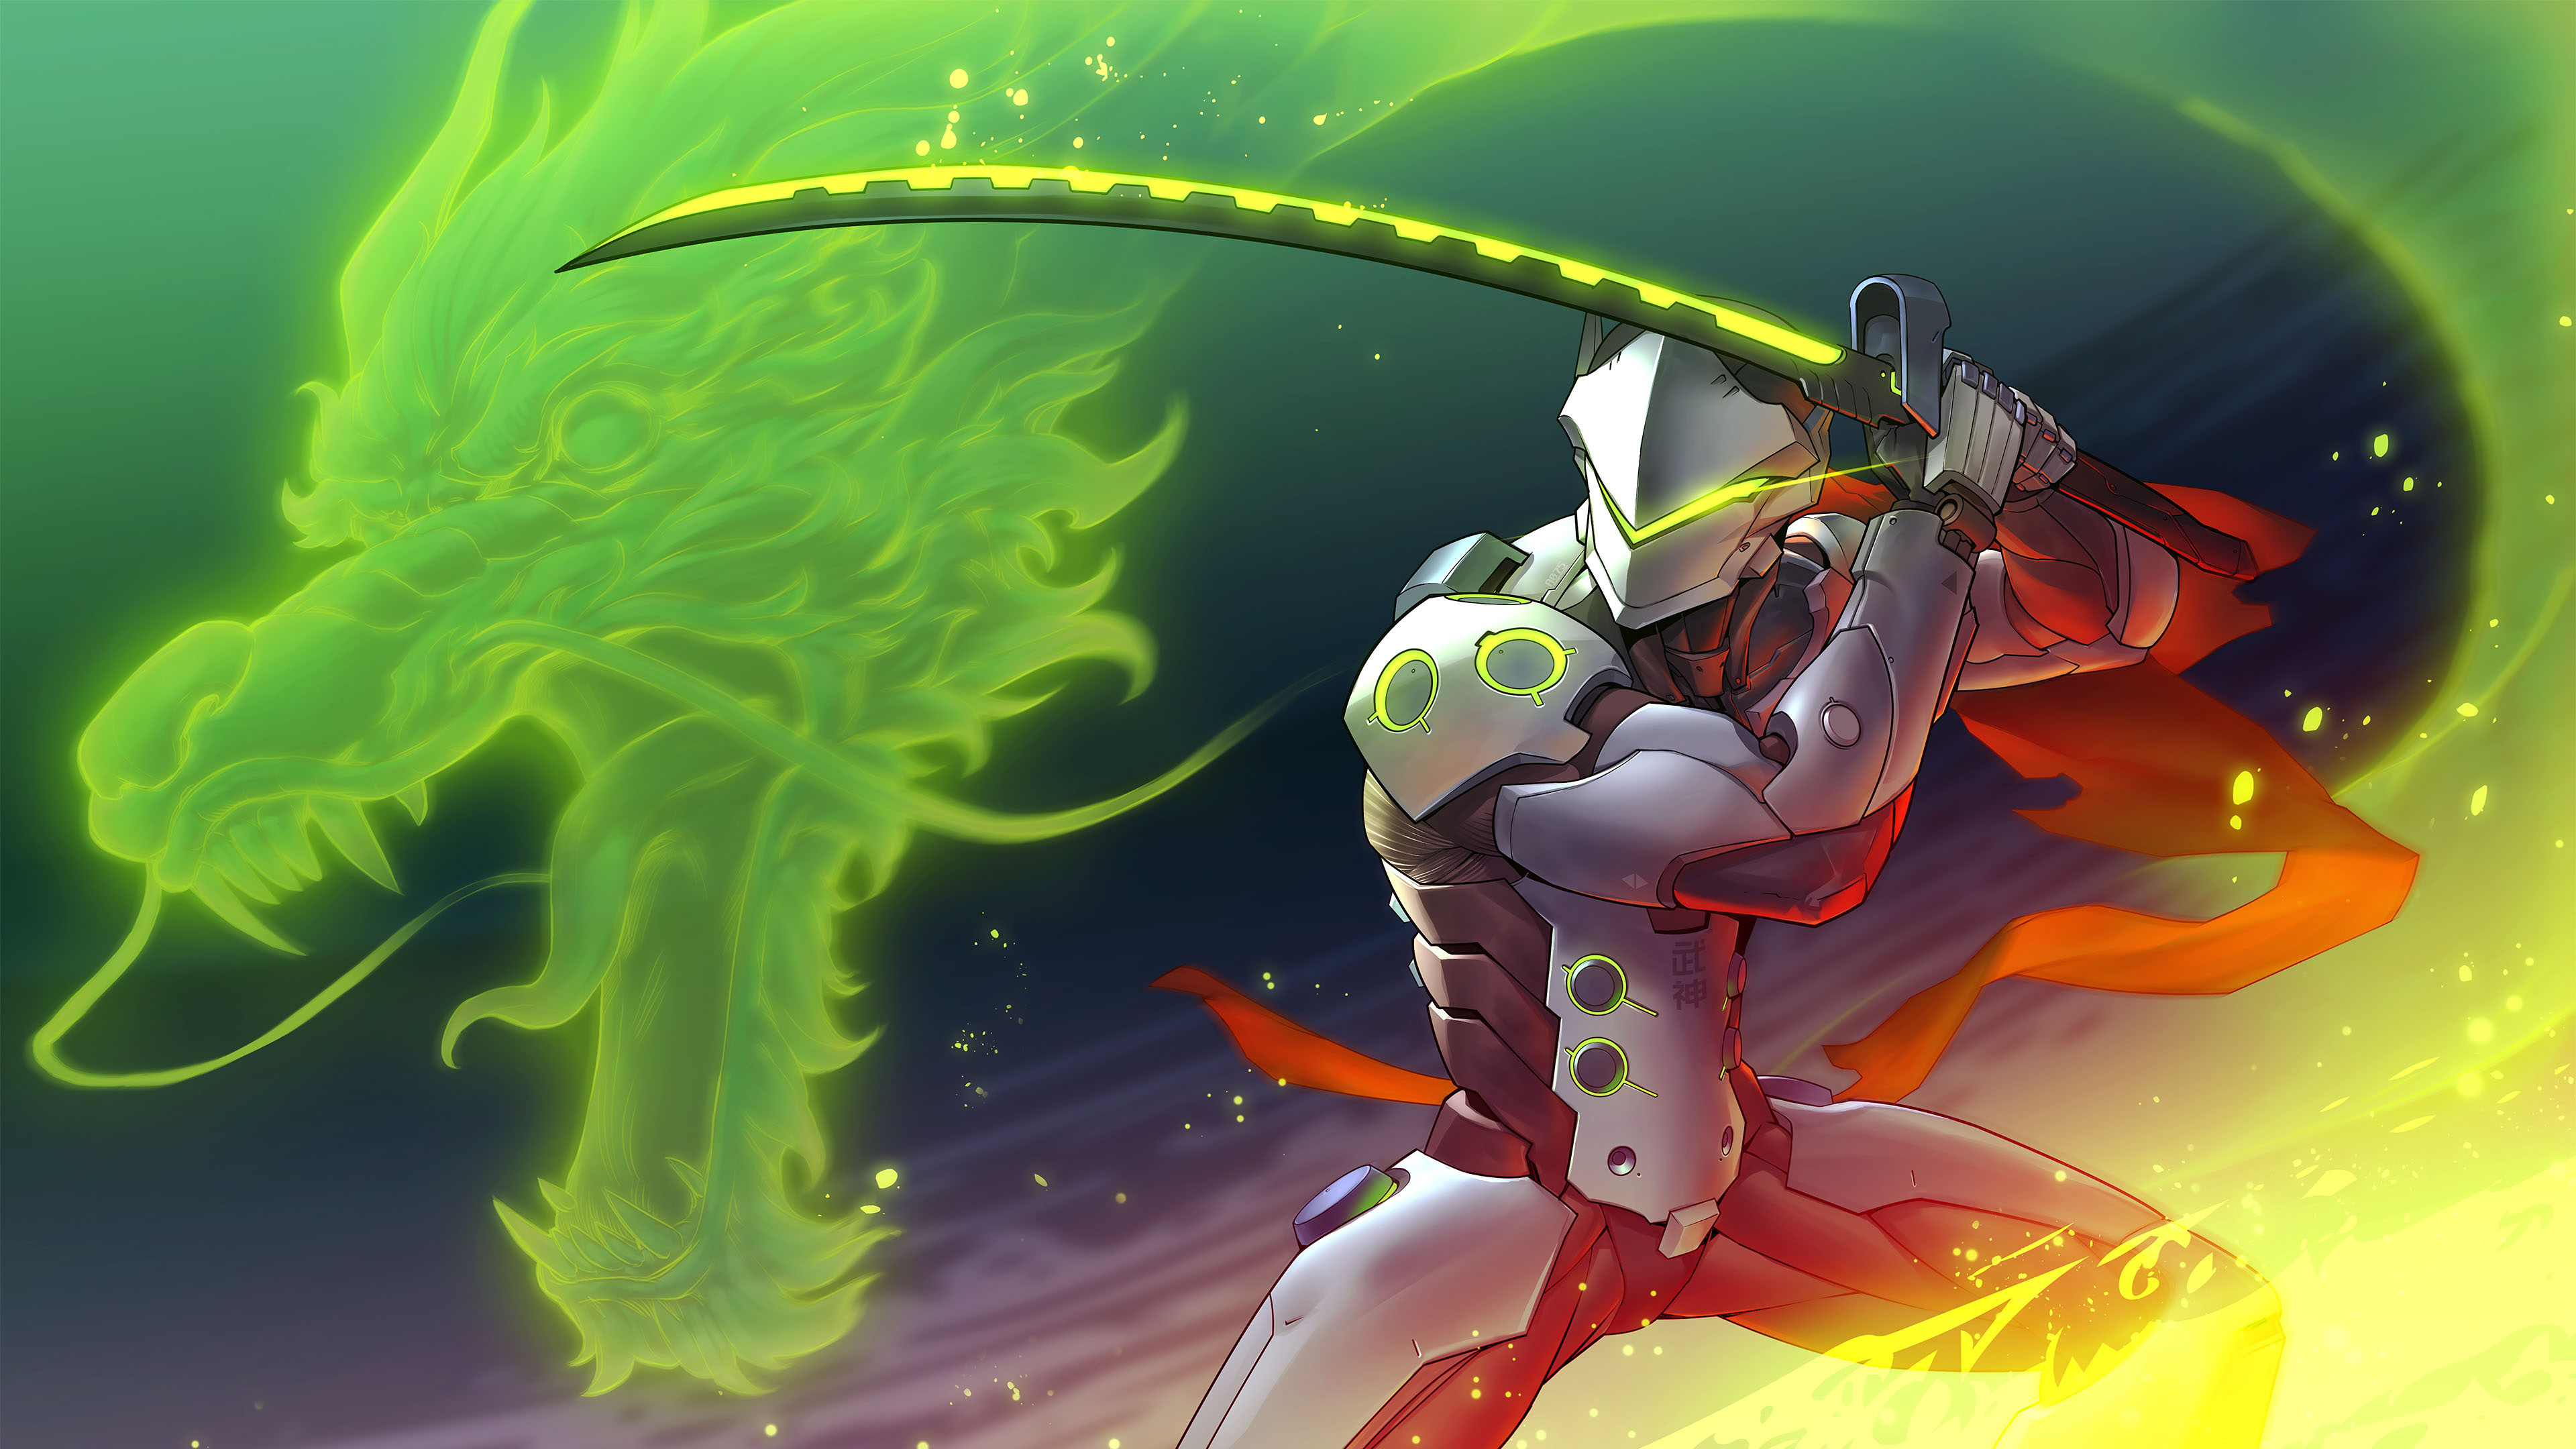 Картинка: Меч, дракон, стойка дракона, доспех, overwatch, Genji